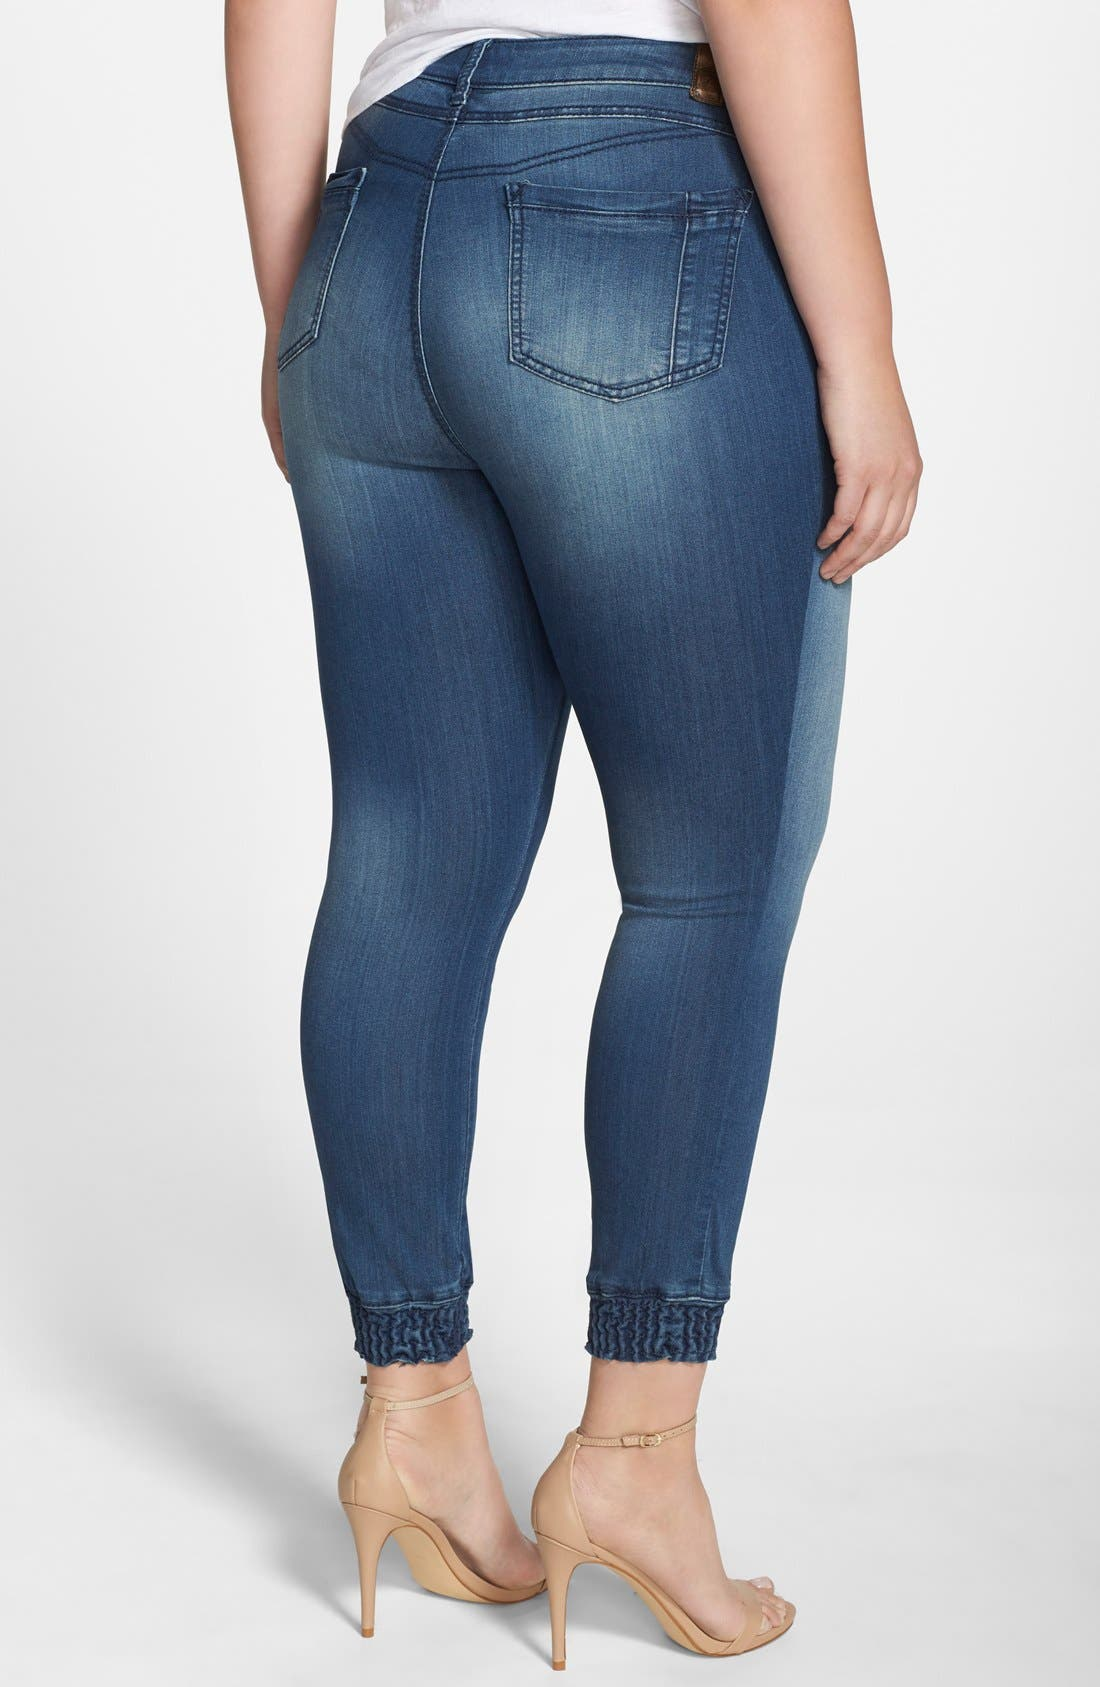 Alternate Image 2  - Poetic Justice 'Suzzie' Stretch Knit Denim Crop Jeans (Plus Size)